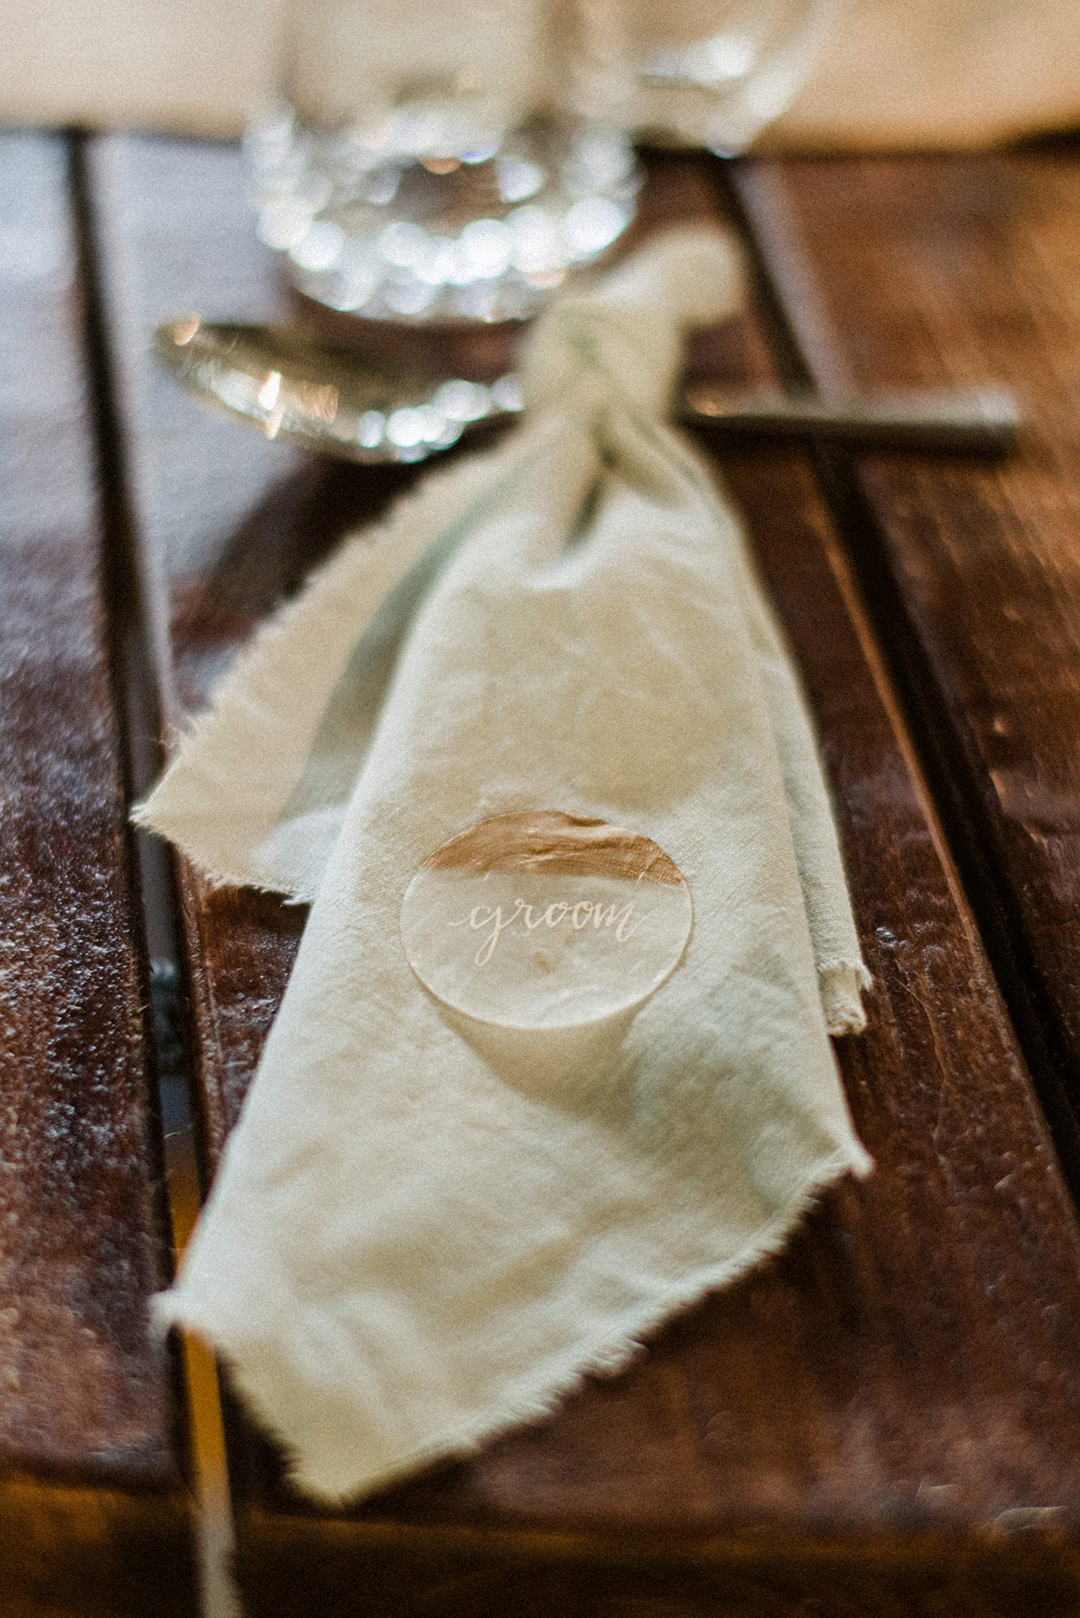 eco friendly napkins at wedding